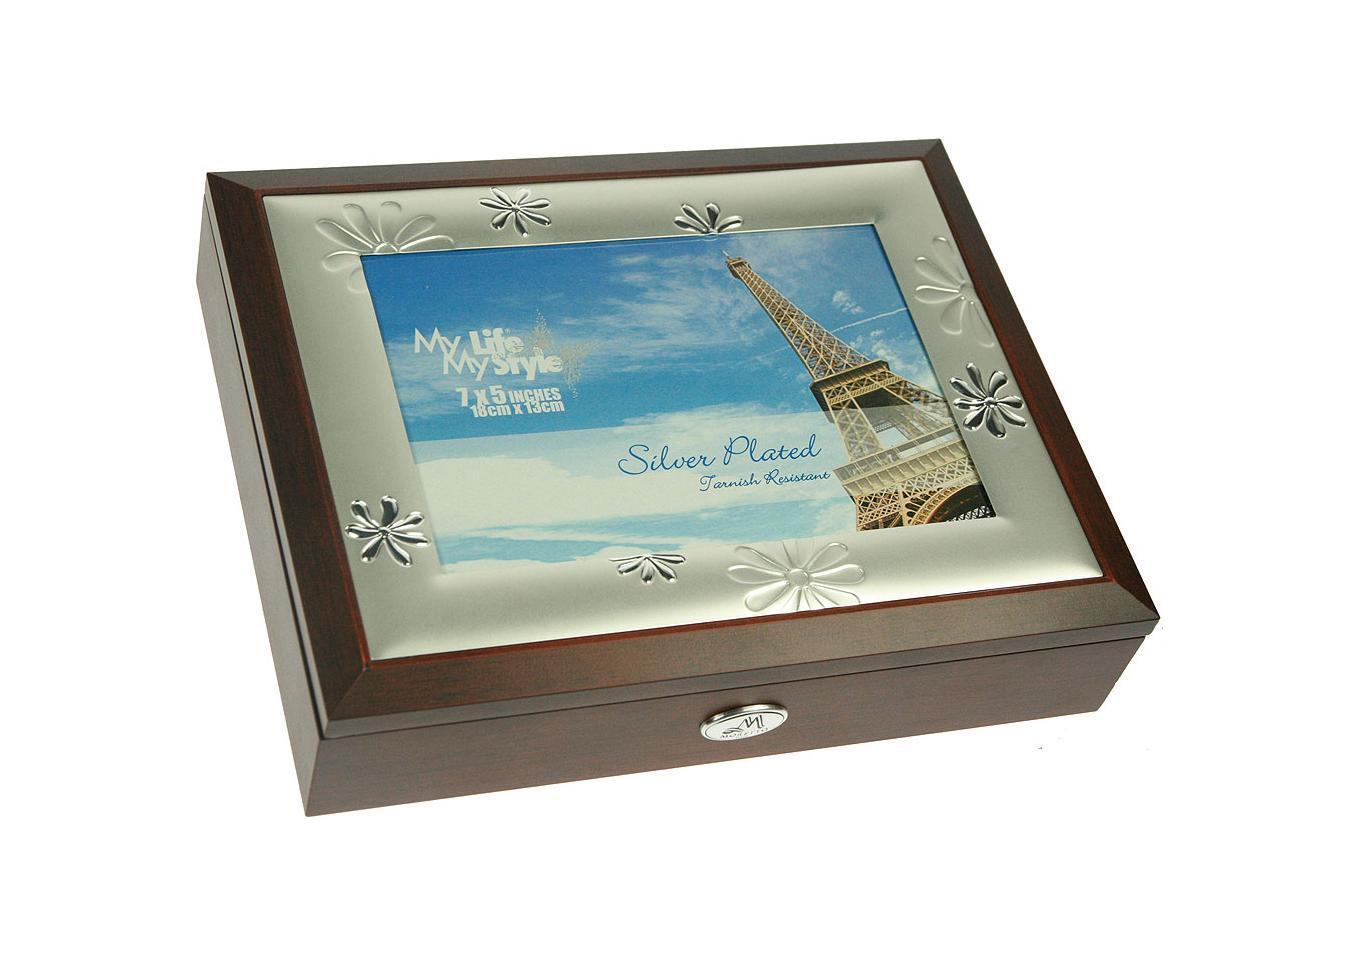 Шкатулка-фоторамка ювелирная Moretto, 24 х 19 х 5 см 139555 шкатулка фоторамка ювелирная русские подарки